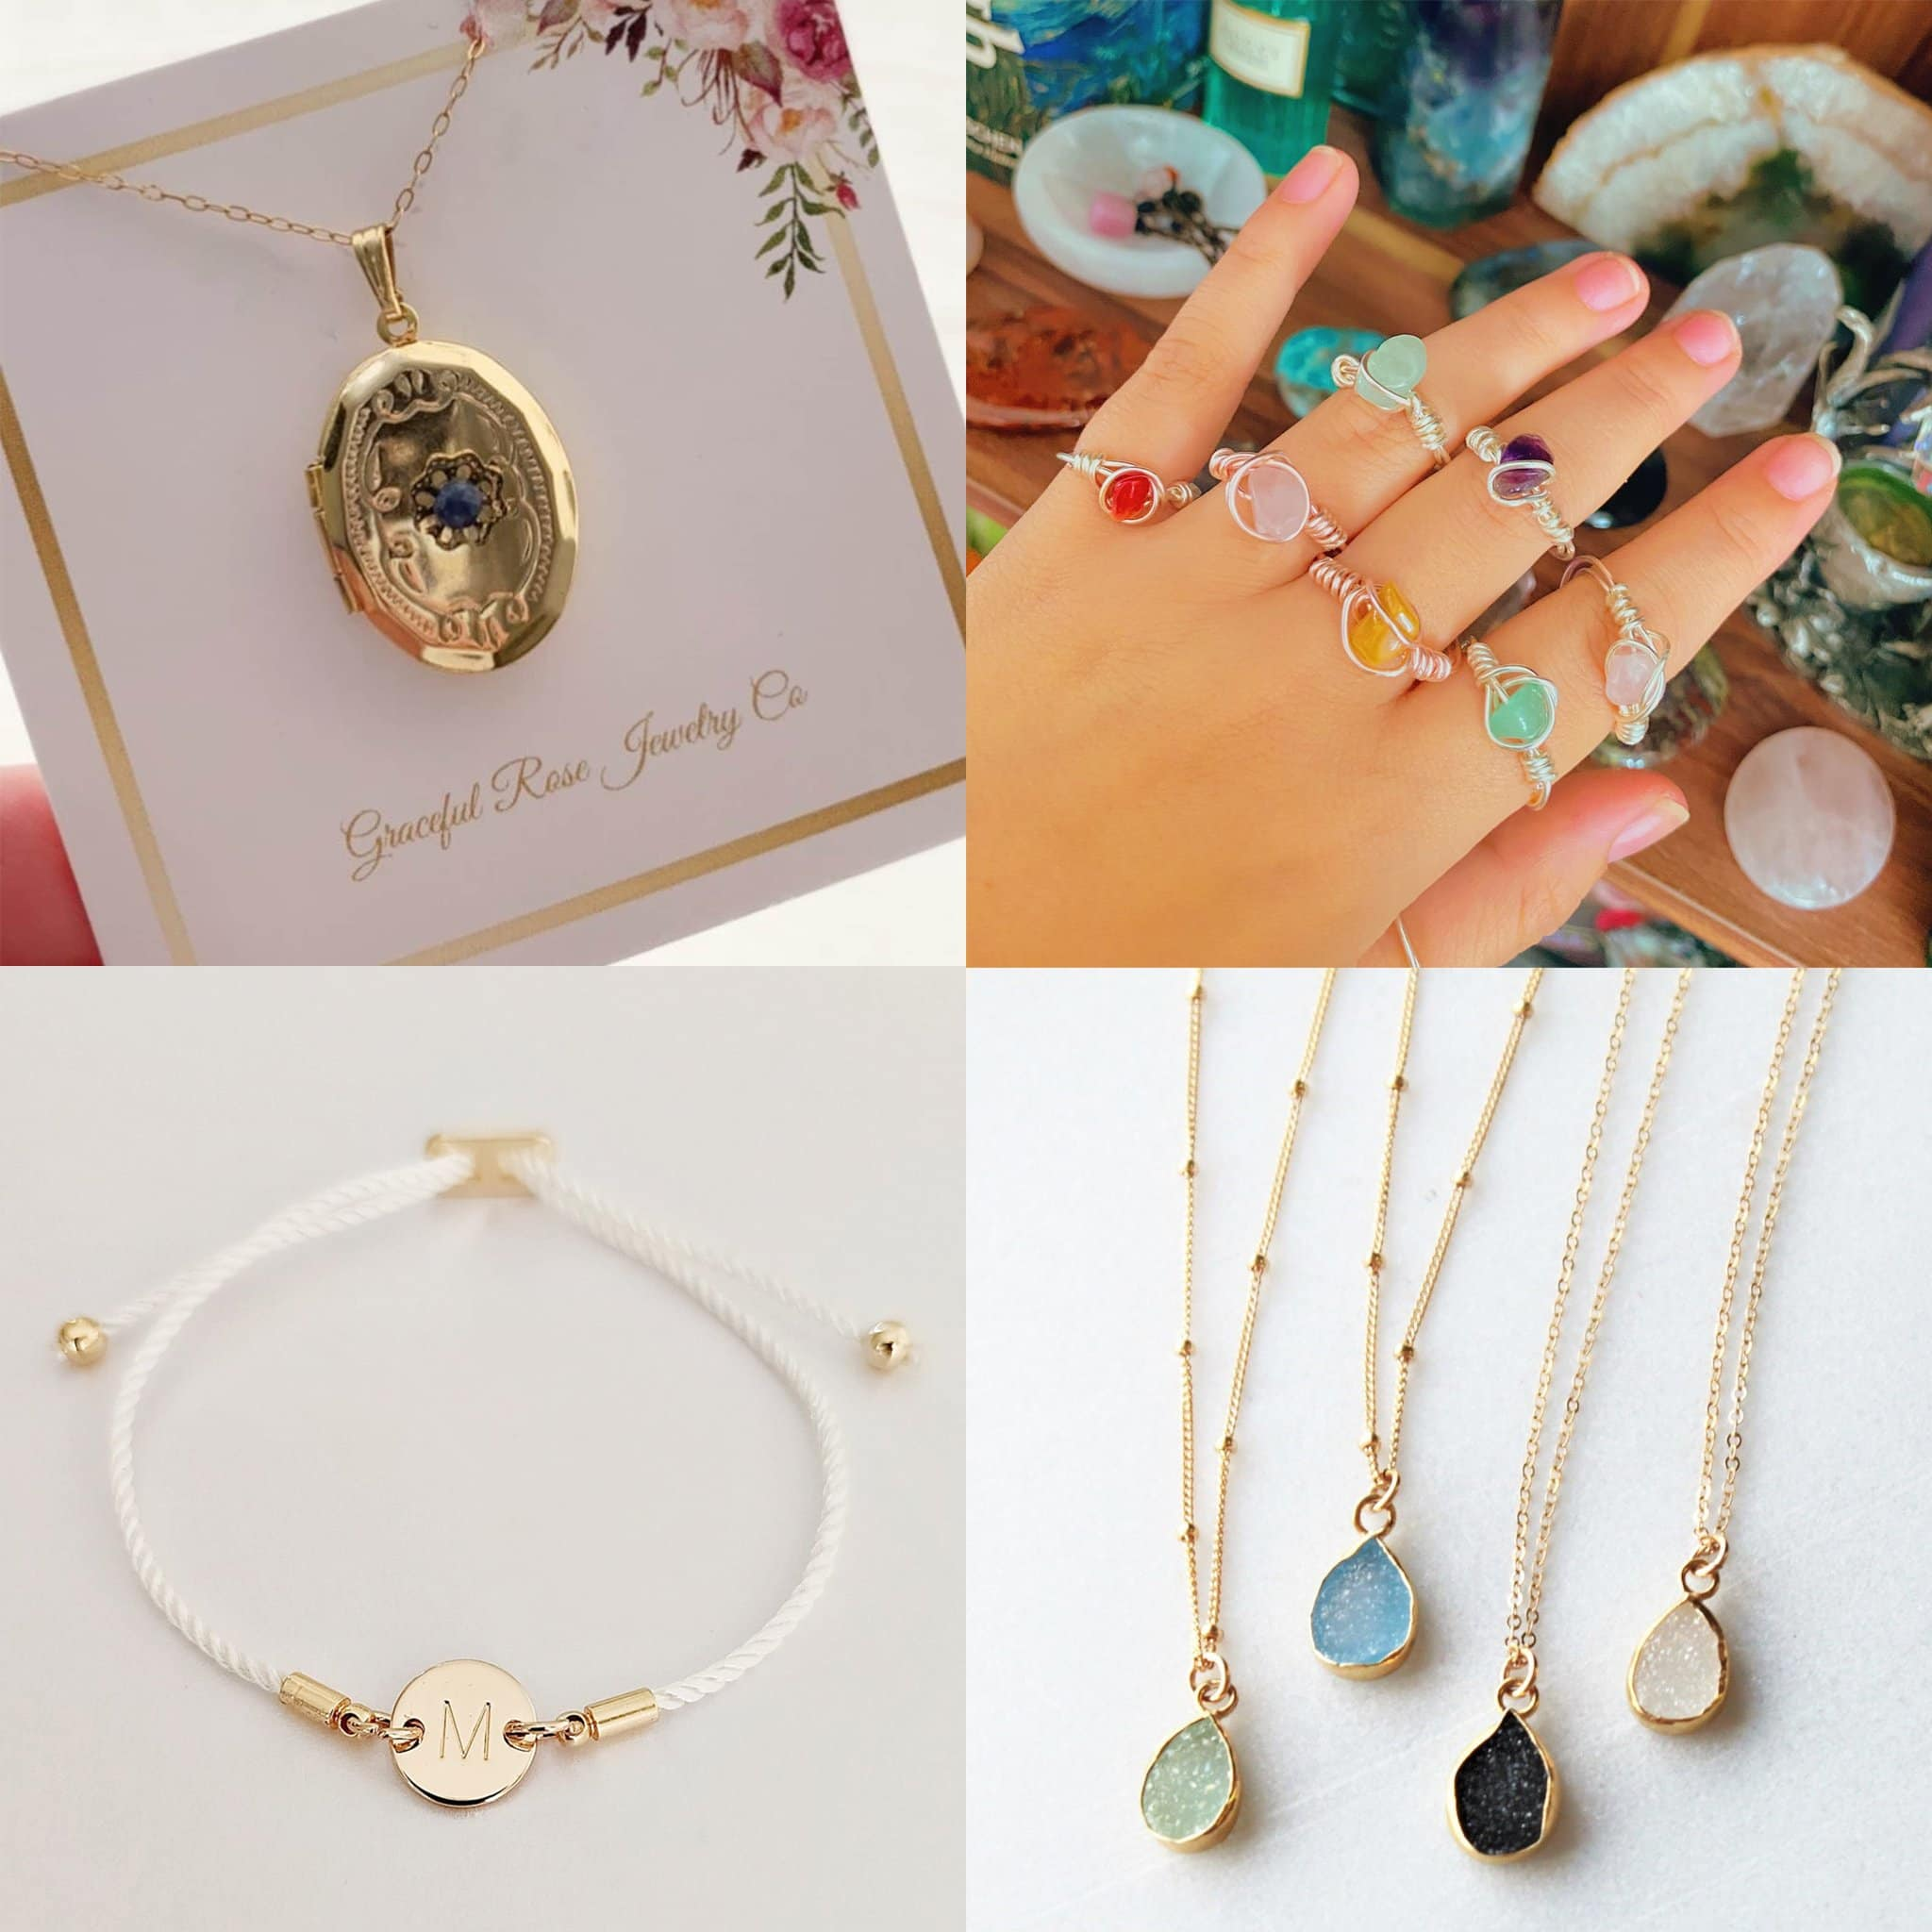 Jewelrycoxoxo Vintage Locket necklace, $120; HandmadebyMadsShop Wire Wrap Healing Crystal Gemstone Rings, $4.55; SheydaCrafts personalized initial bracelet, $18.48; TheSilverWren Tiny Druzy Raw Crystal Necklace, $36